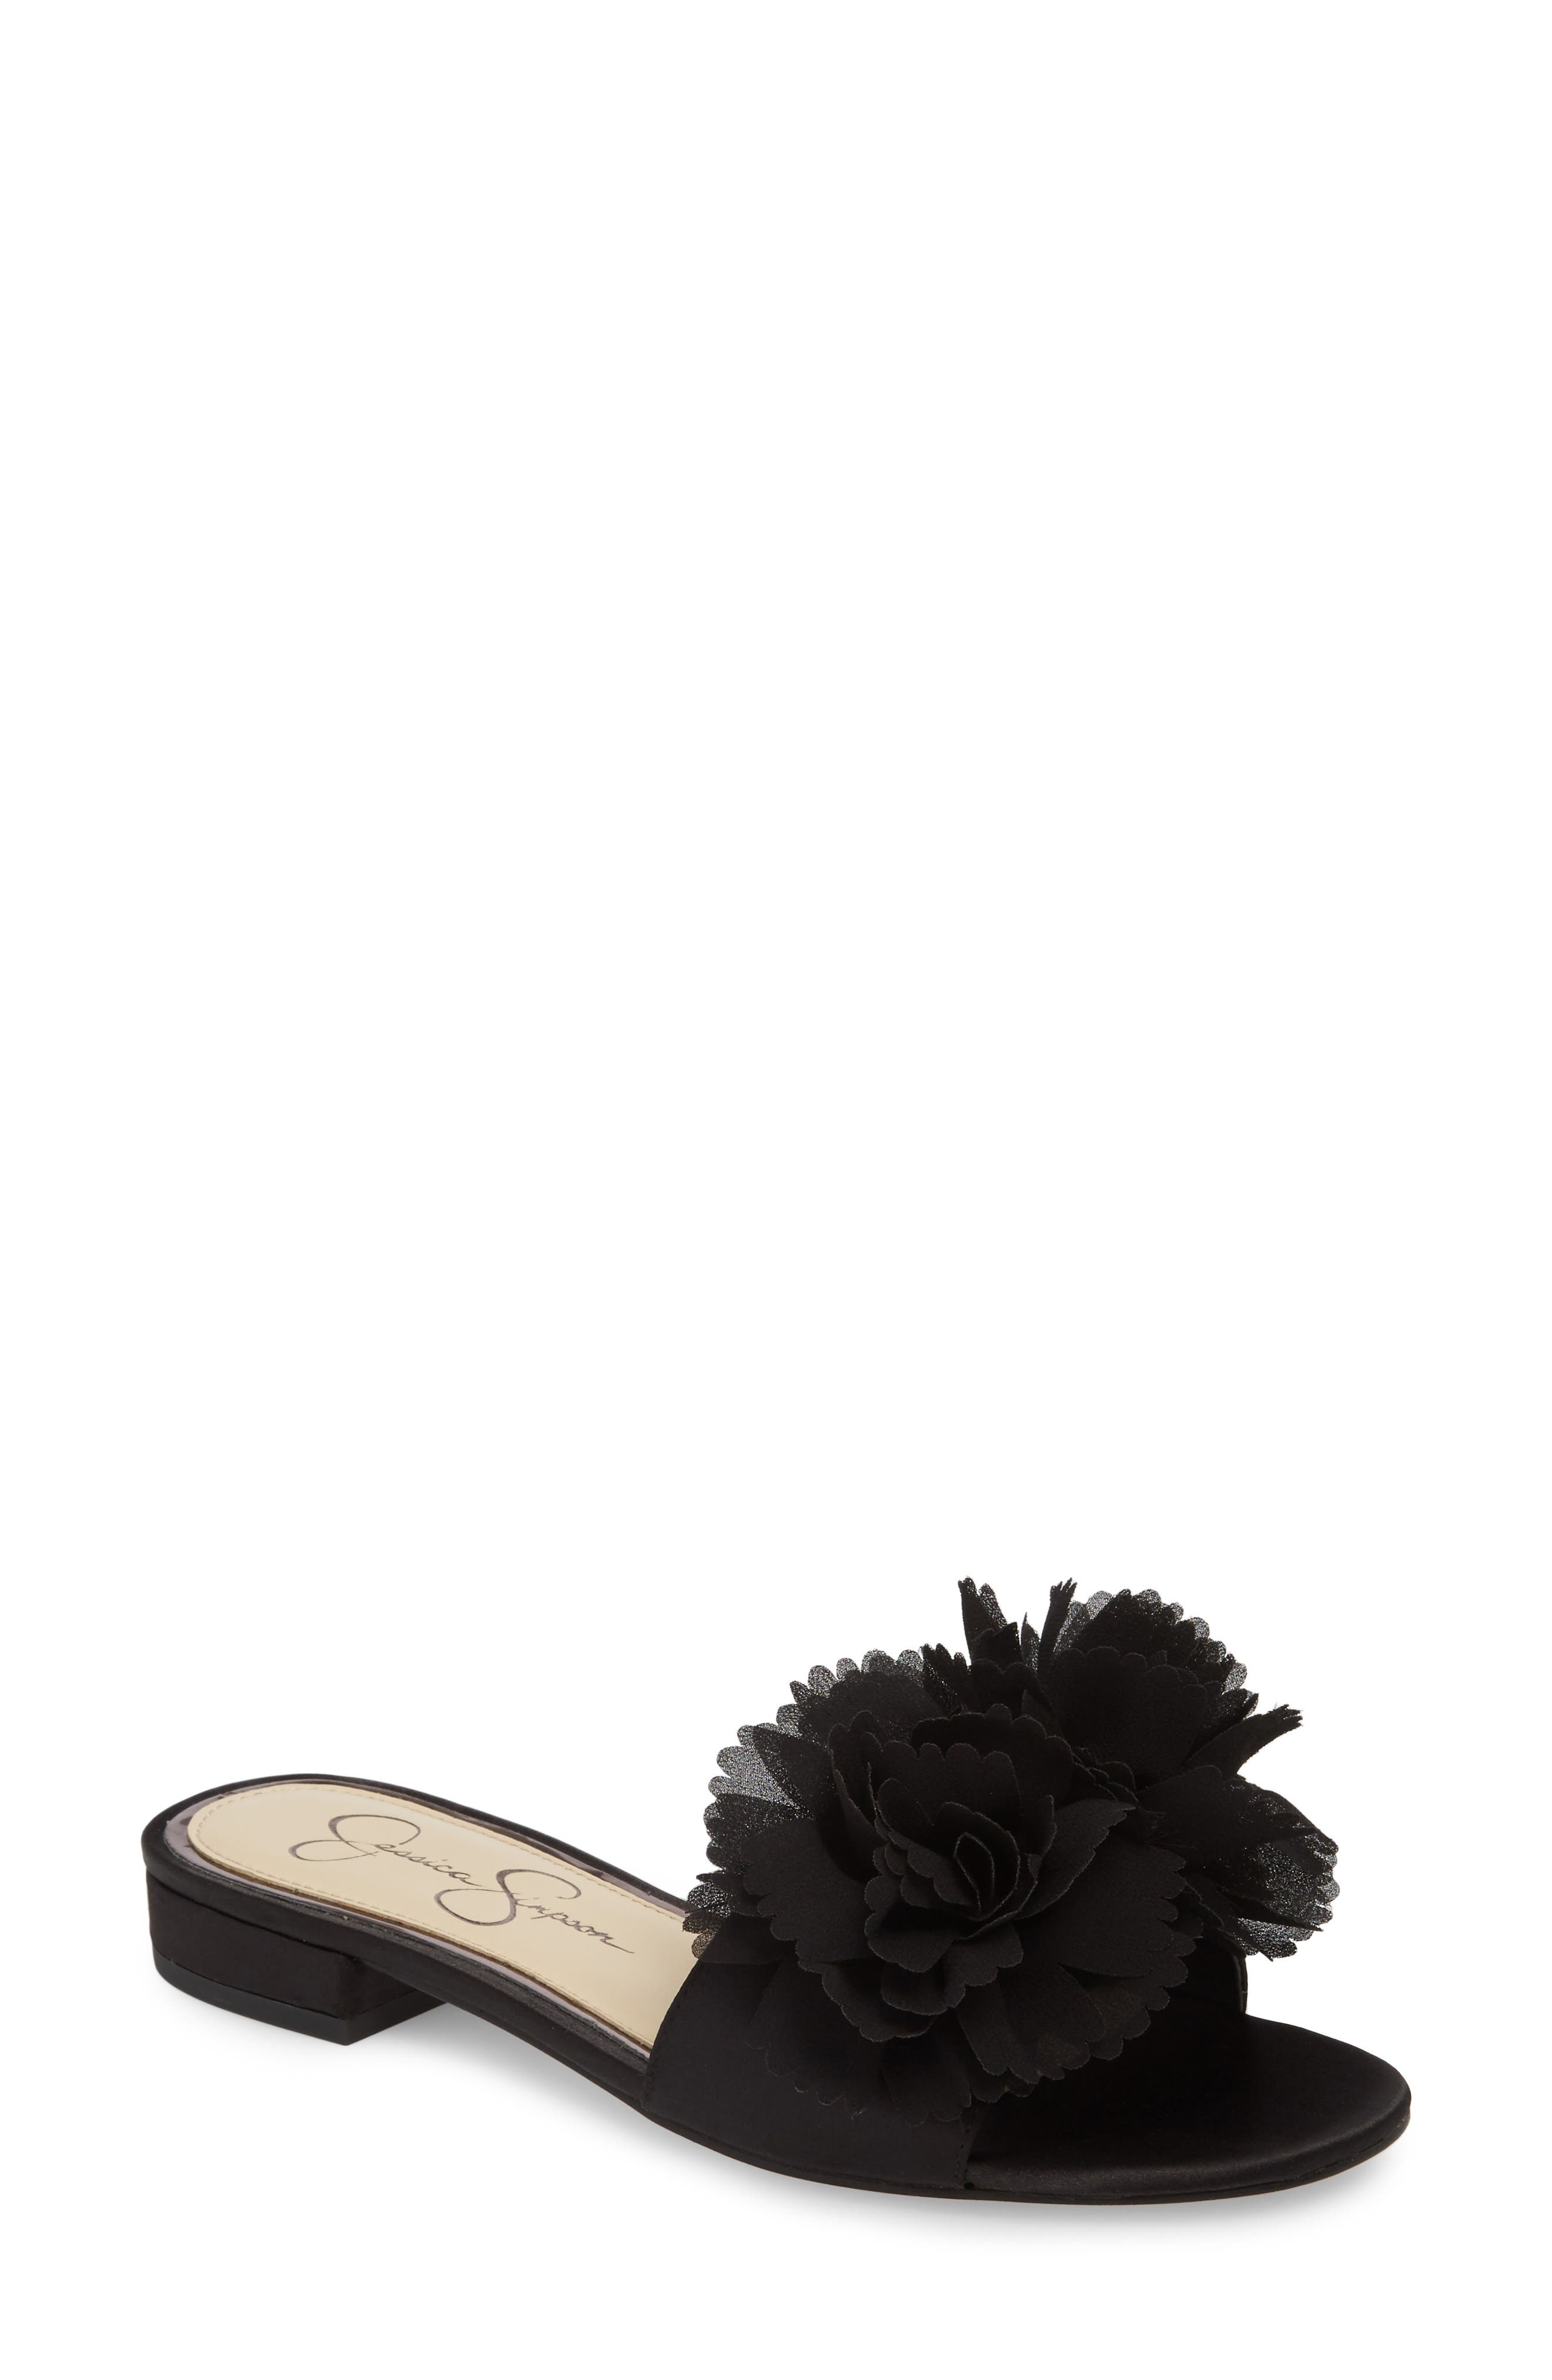 Caralin Slide Sandal,                         Main,                         color, 001